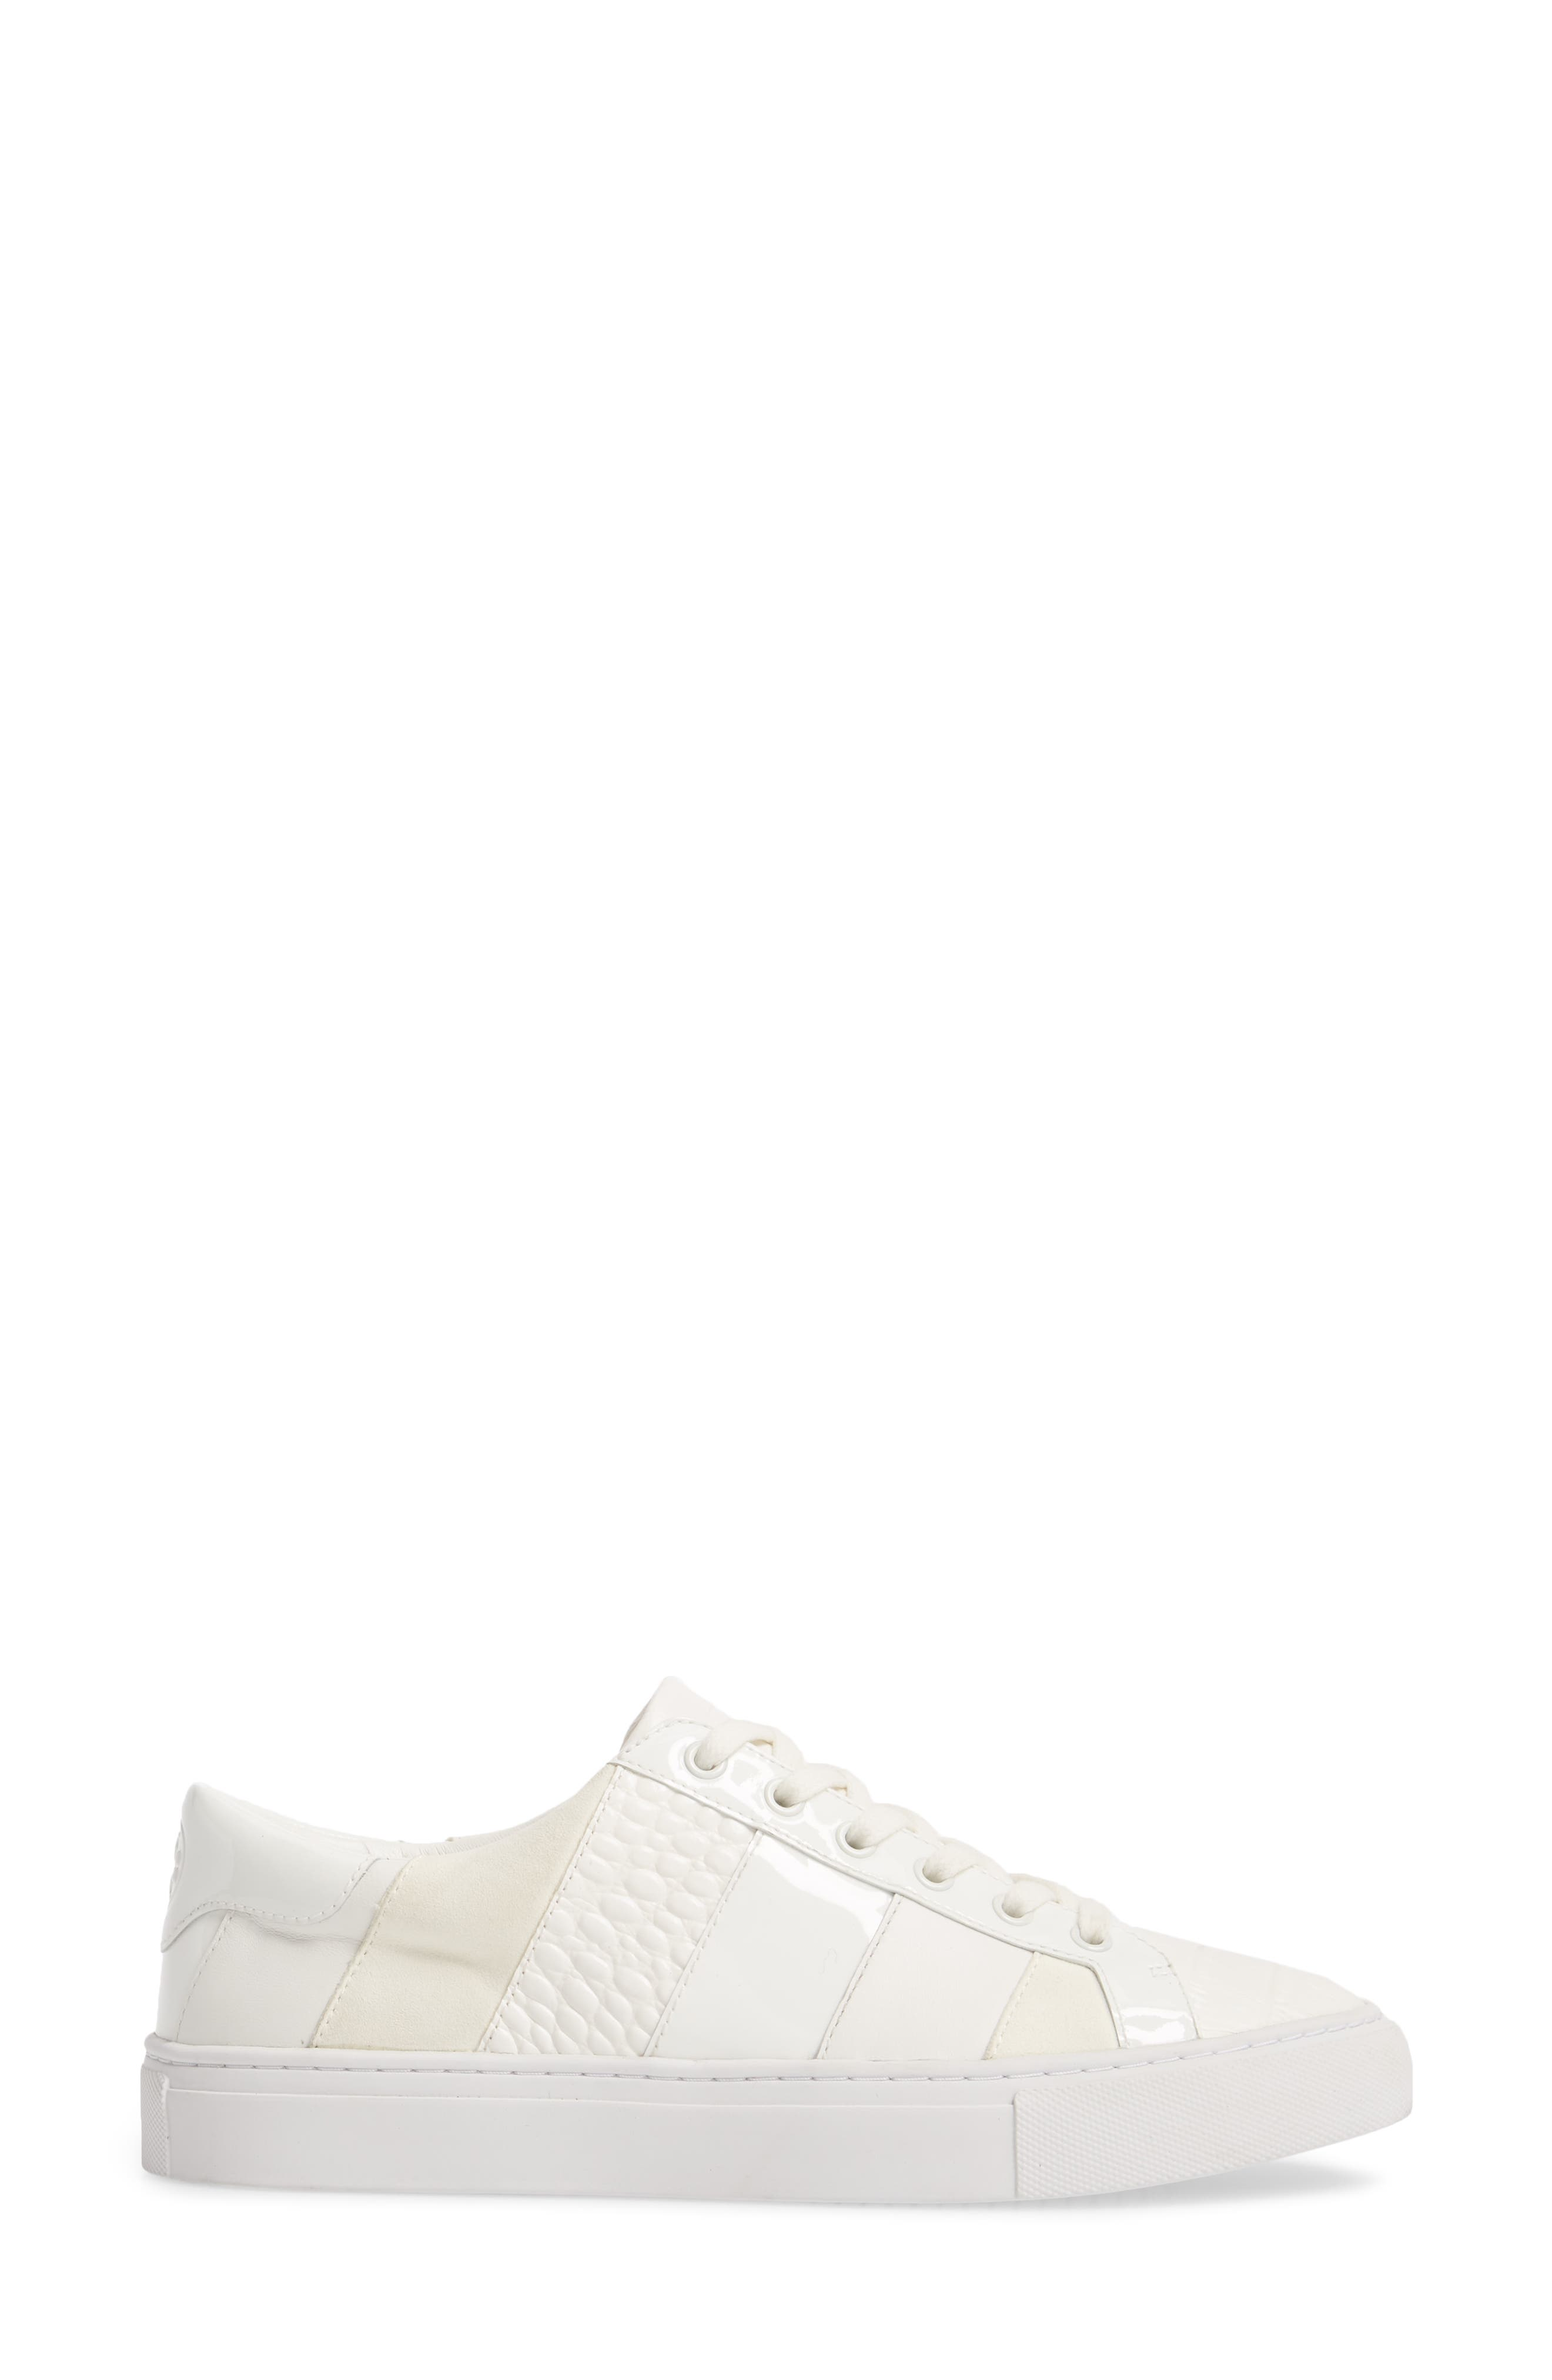 Ames Sneaker,                             Alternate thumbnail 3, color,                             SNOW WHITE